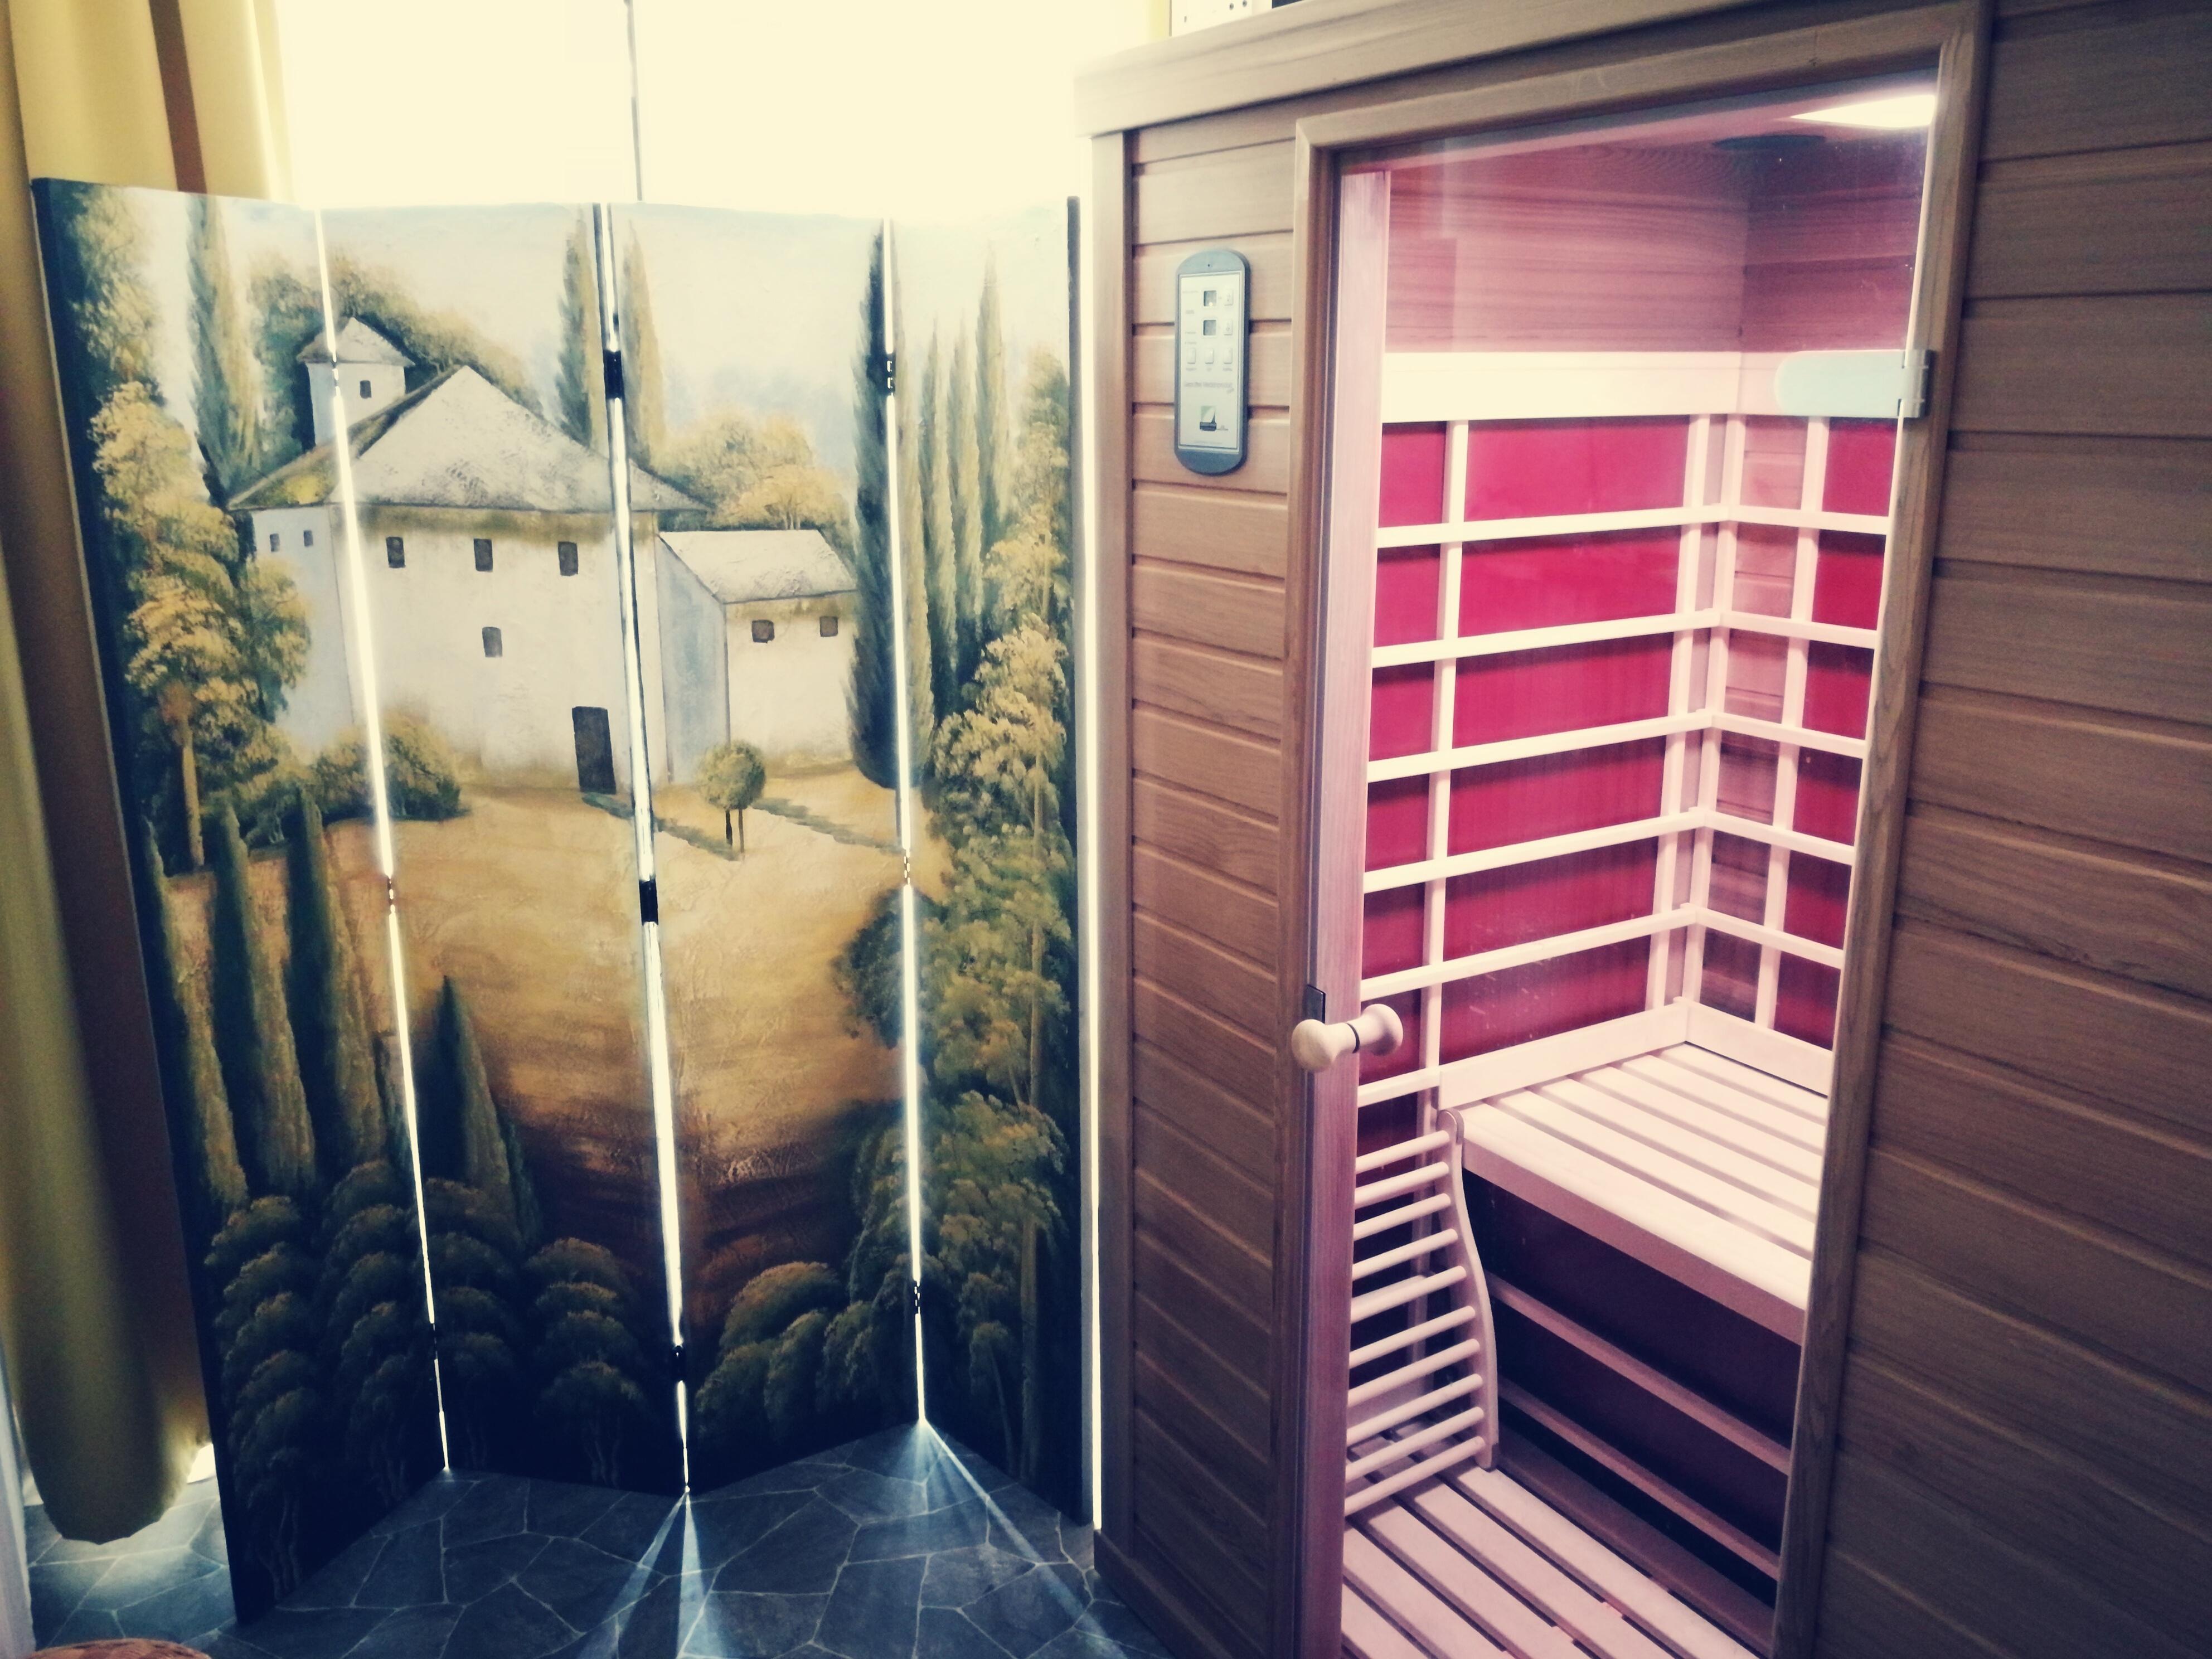 sauna mit infrarotw rme wellness in der infrarotw rmekabine. Black Bedroom Furniture Sets. Home Design Ideas